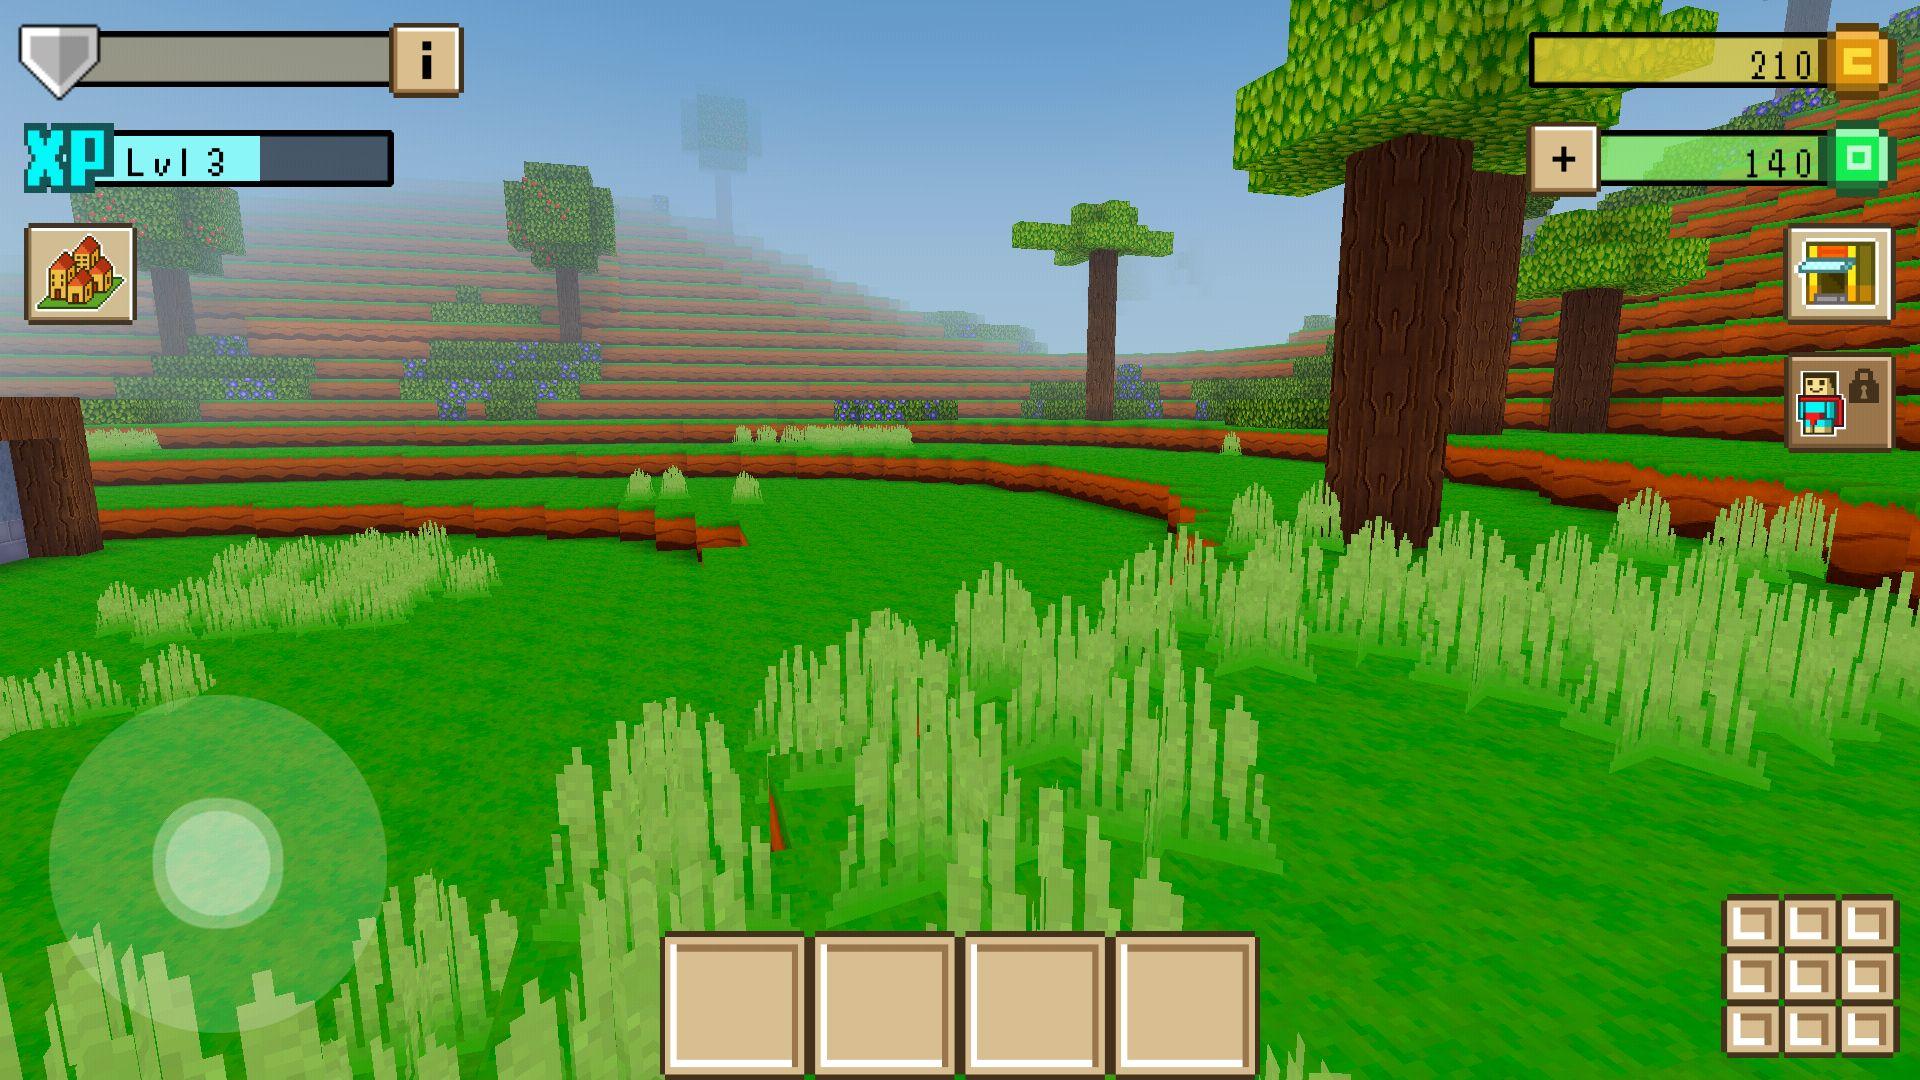 androidアプリ ブロッククラフト3D(Block Craft 3D)攻略スクリーンショット1